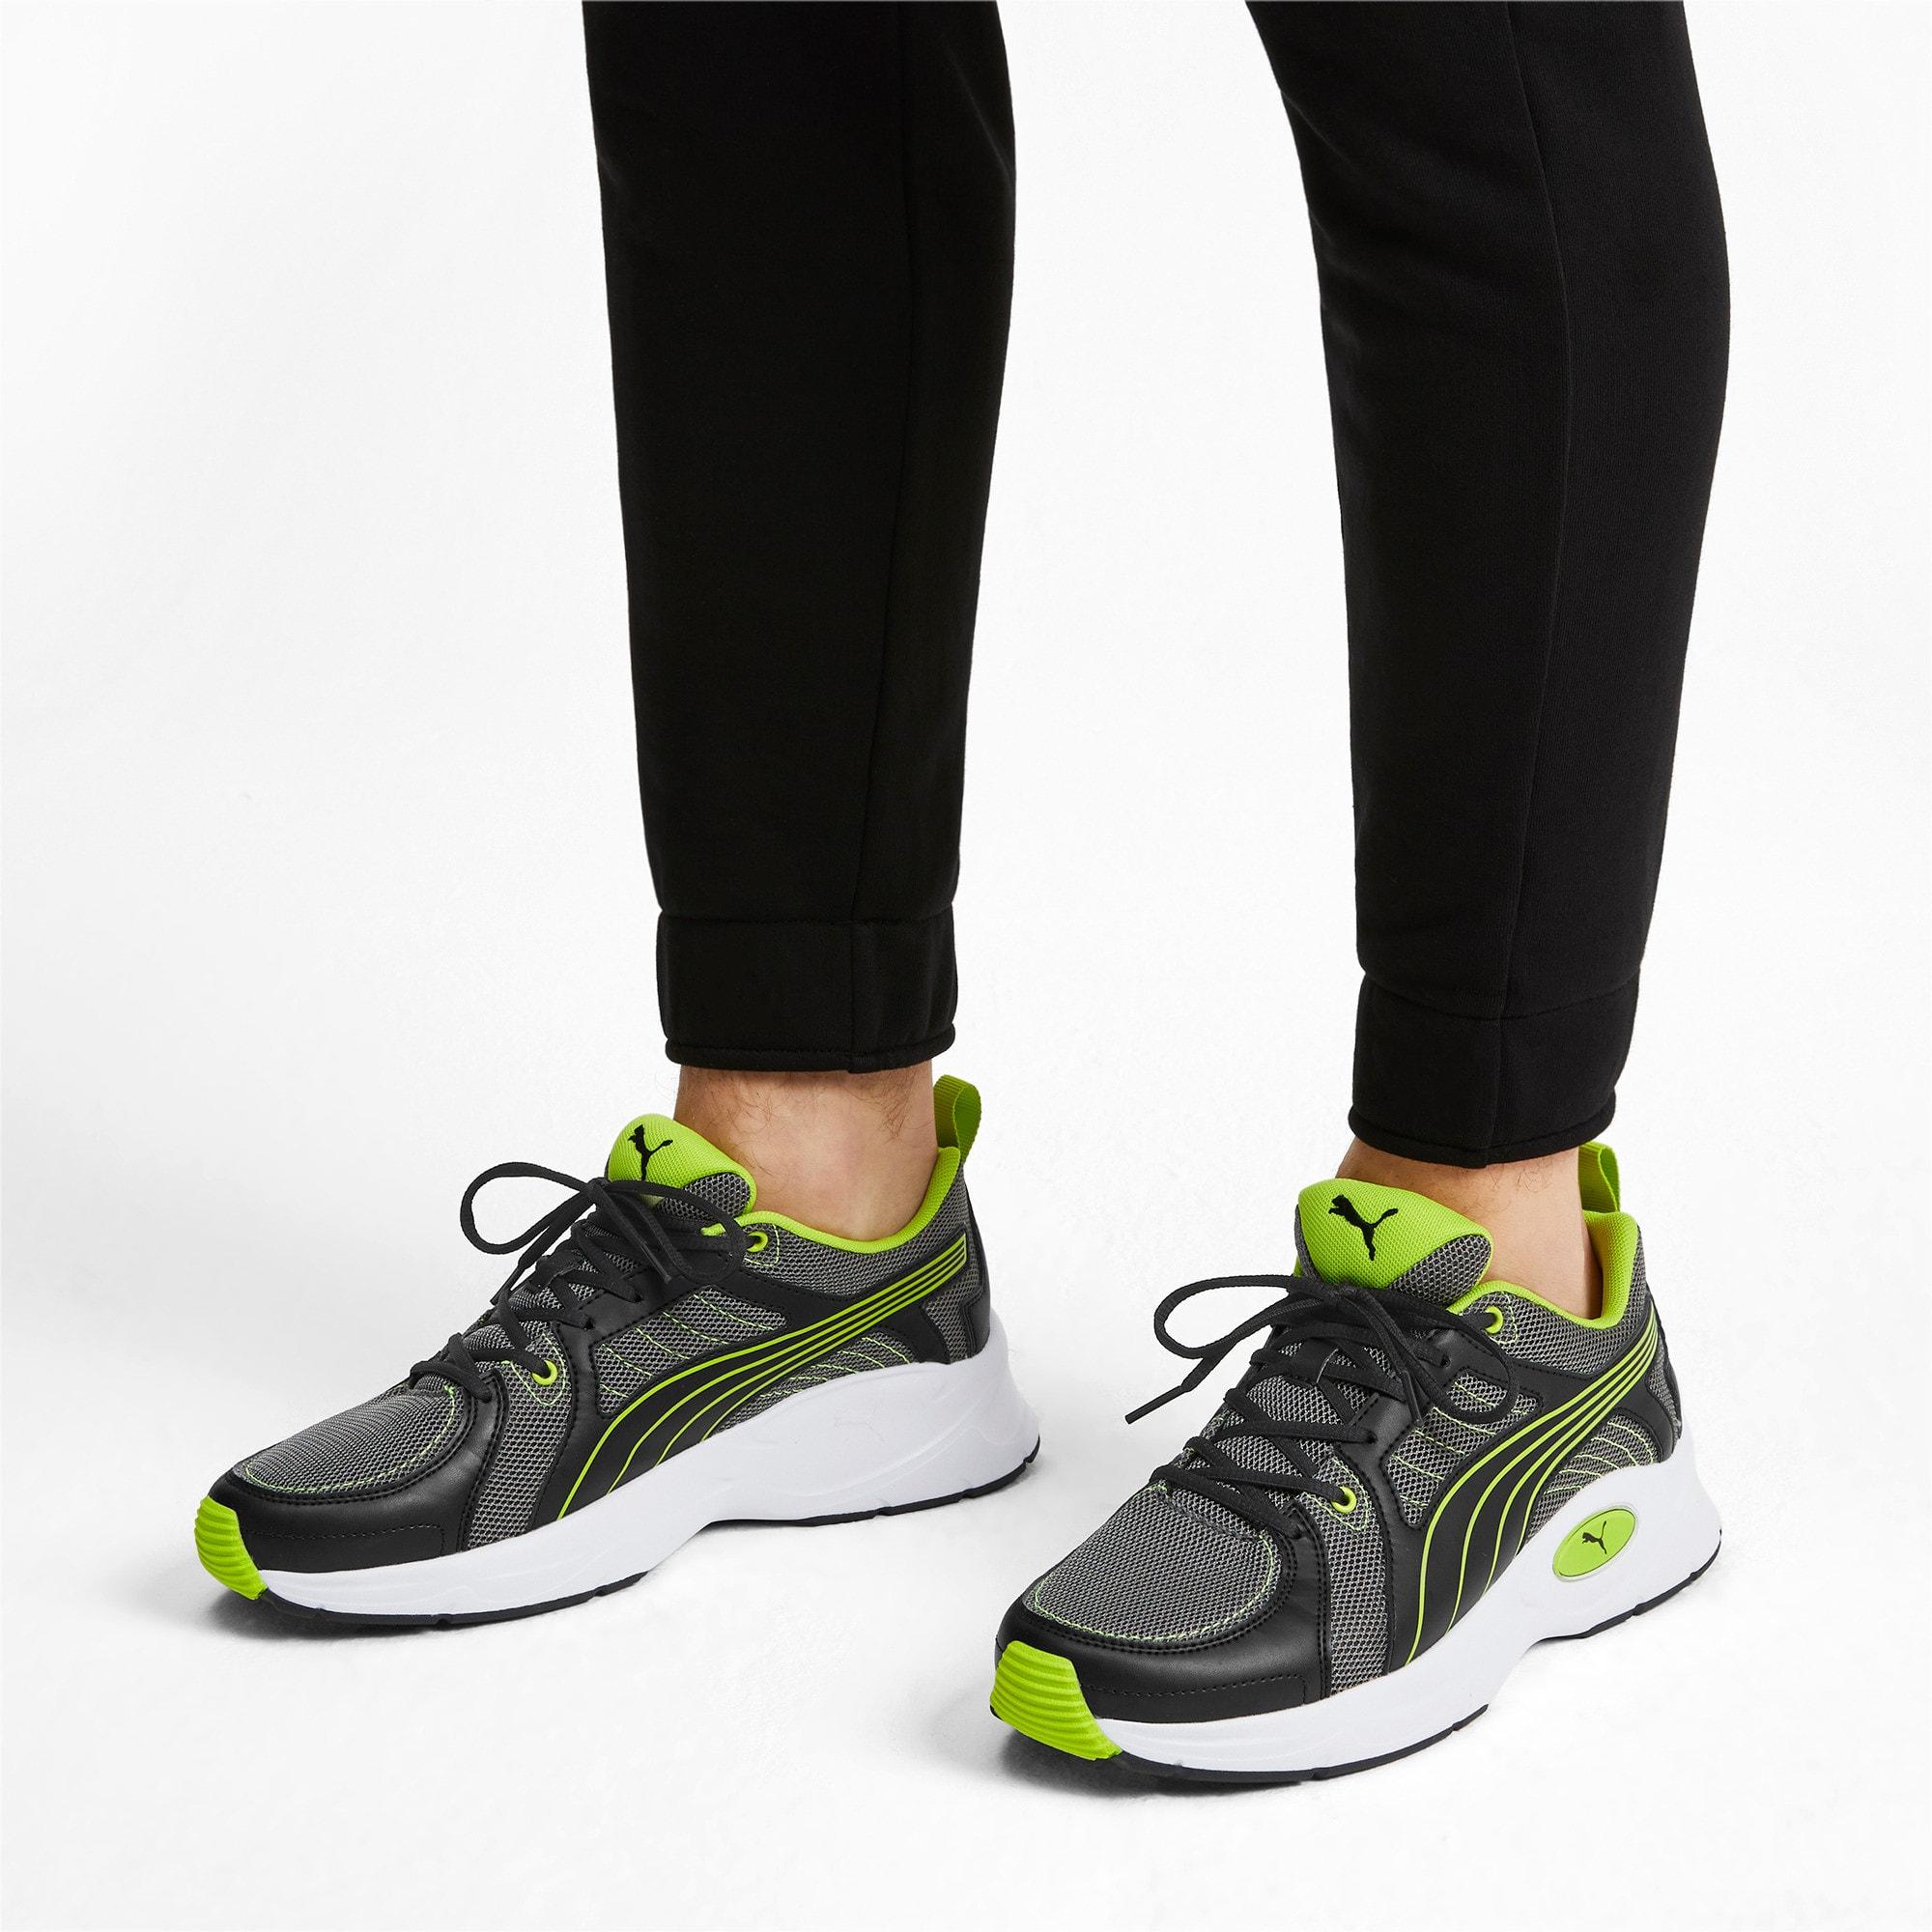 Thumbnail 2 of Nucleus Run Training Shoes, CASTLEROCK-Limepunch, medium